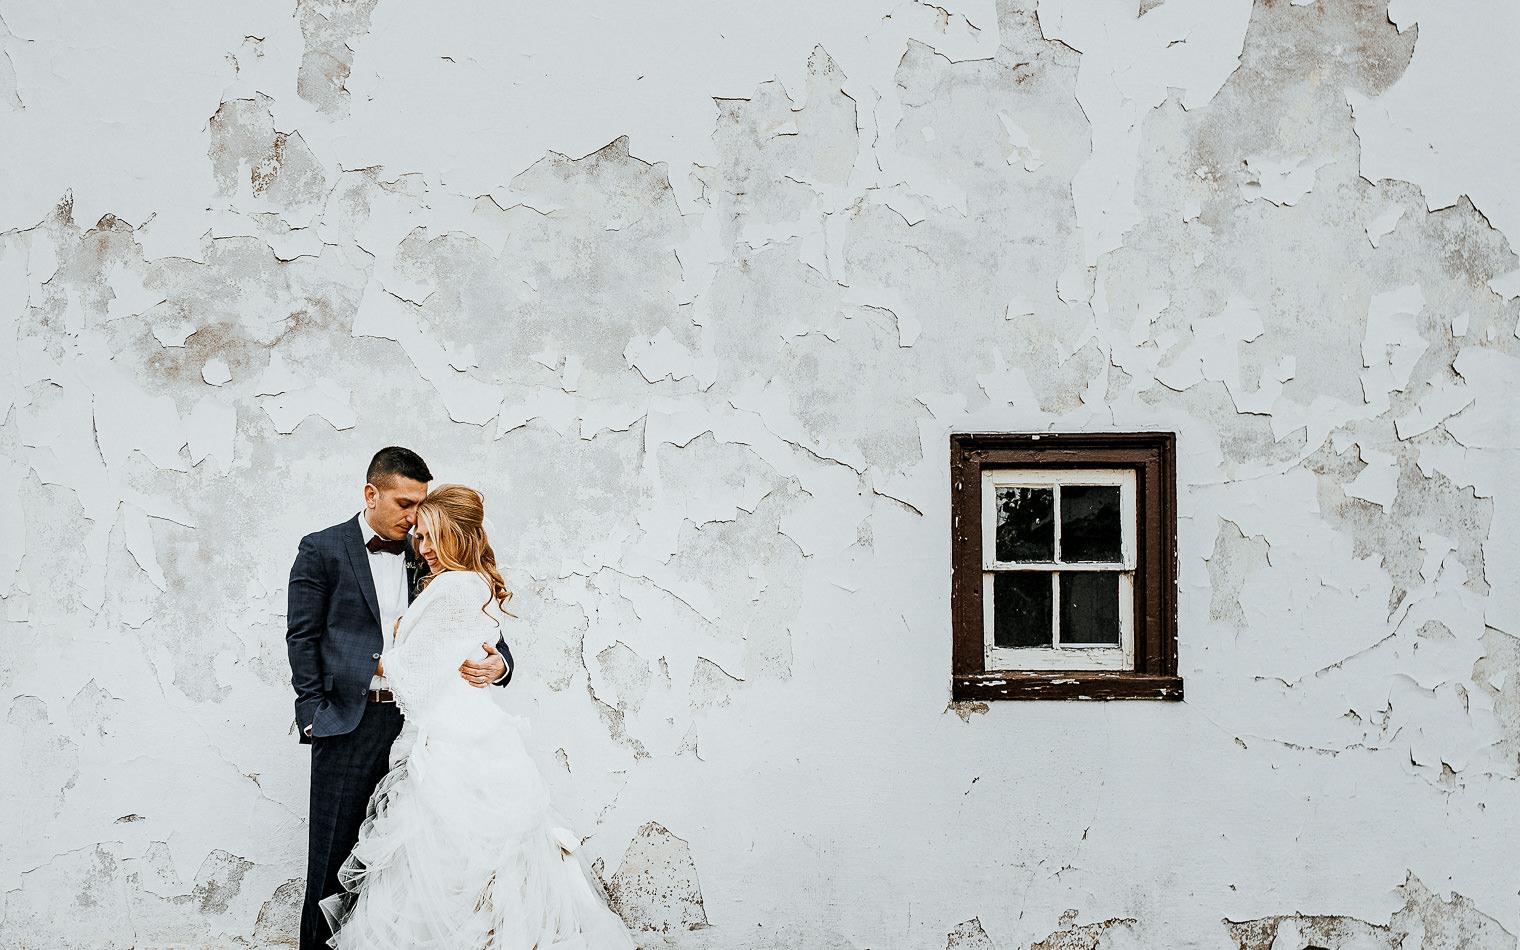 Twisted-Oaks-Studio-leica-m10-review-wedding-0001.jpg